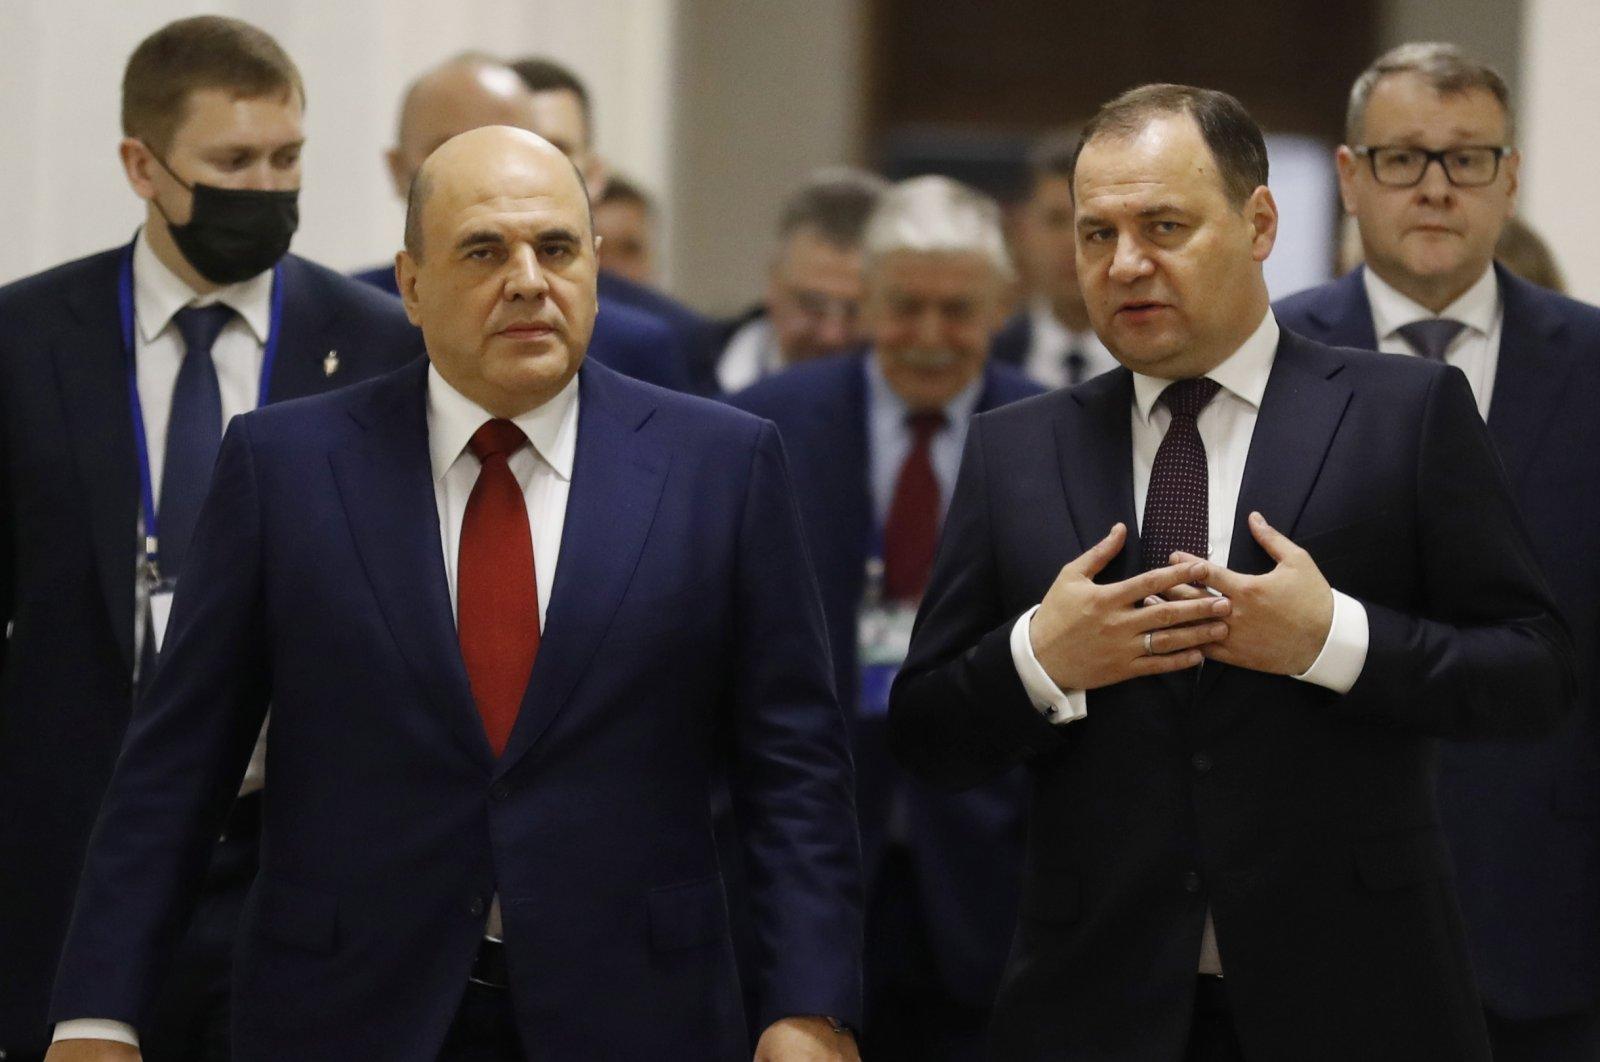 Russian Prime Minister Mikhail Mishustin (front L) and Belarusian Prime Minister Roman Golovchenko (front R) meet in Minsk, Belarus, 27 May 2021.  (EPA/DMITRY ASTAKHOV / SPUTNIK / GOVERNMENT PRESS SERVICE)